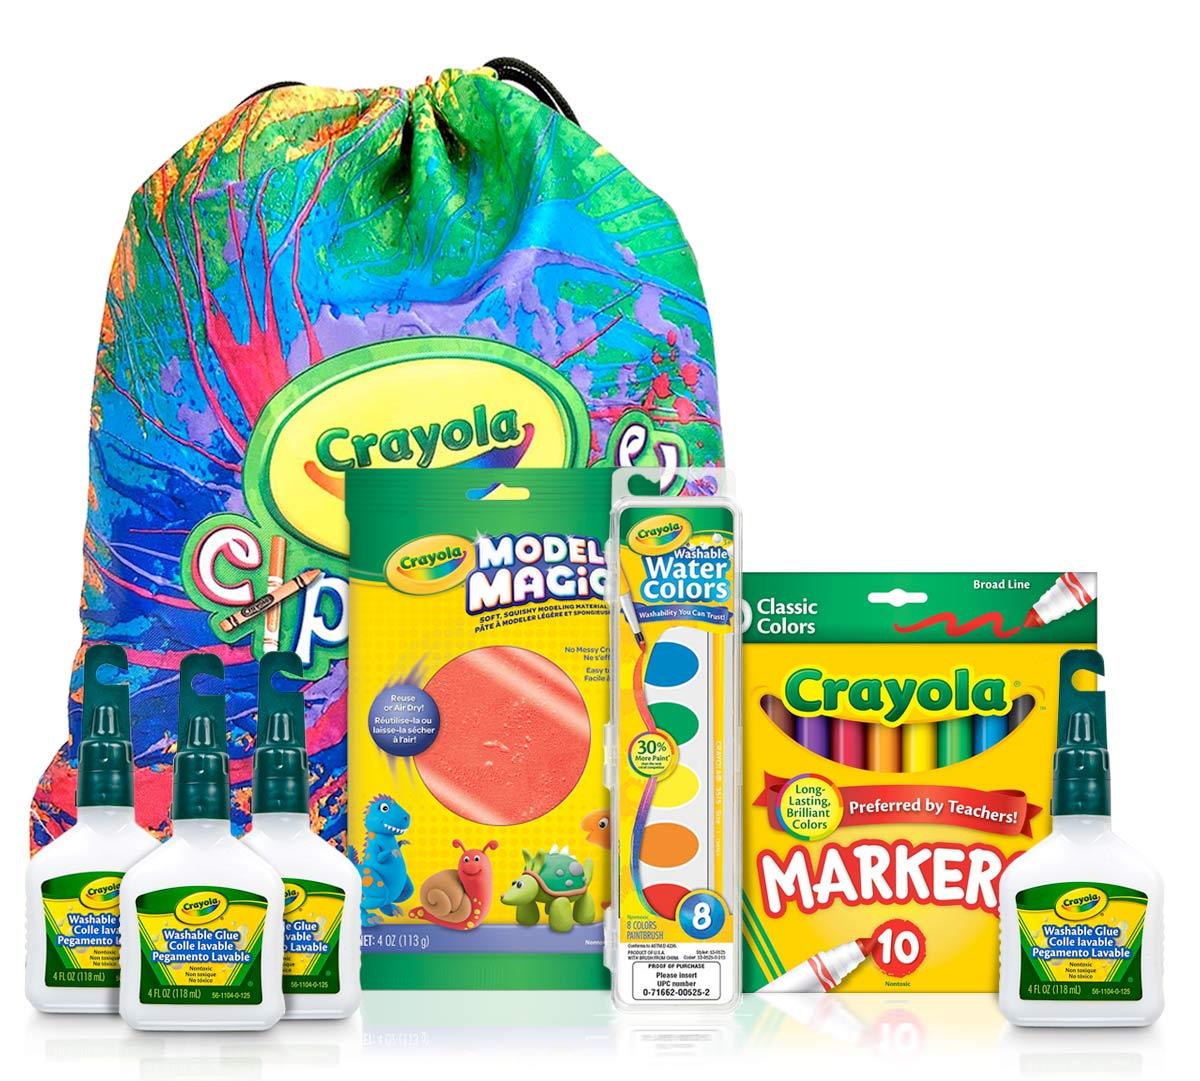 3-in-1 DIY Slime Kit, Slime Supplies   Crayola.com   Crayola